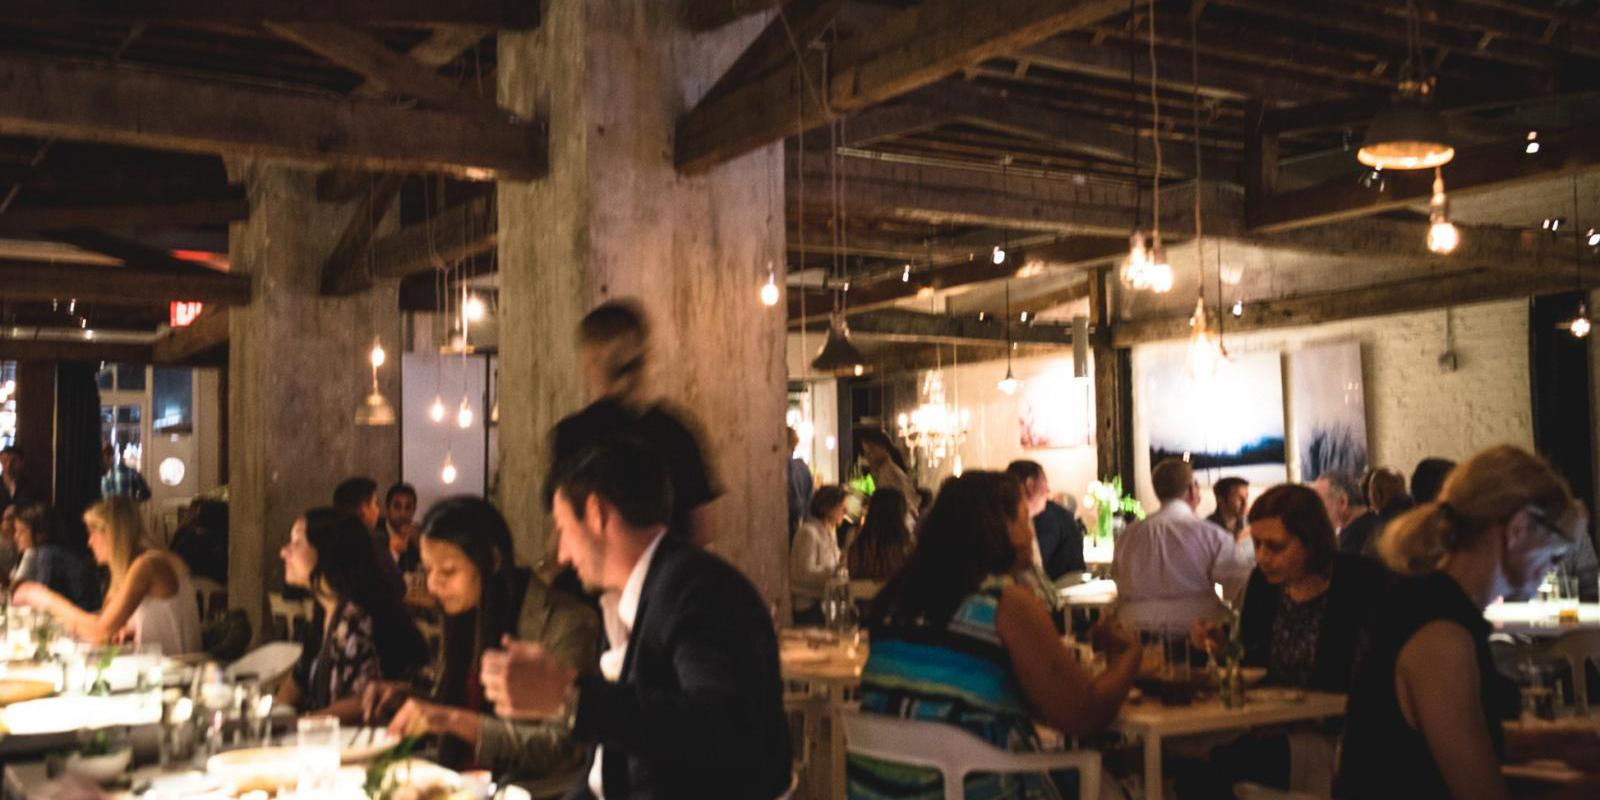 ABC Kitchen NYC - A Lunch Hot Spot in Midtown Manhattan